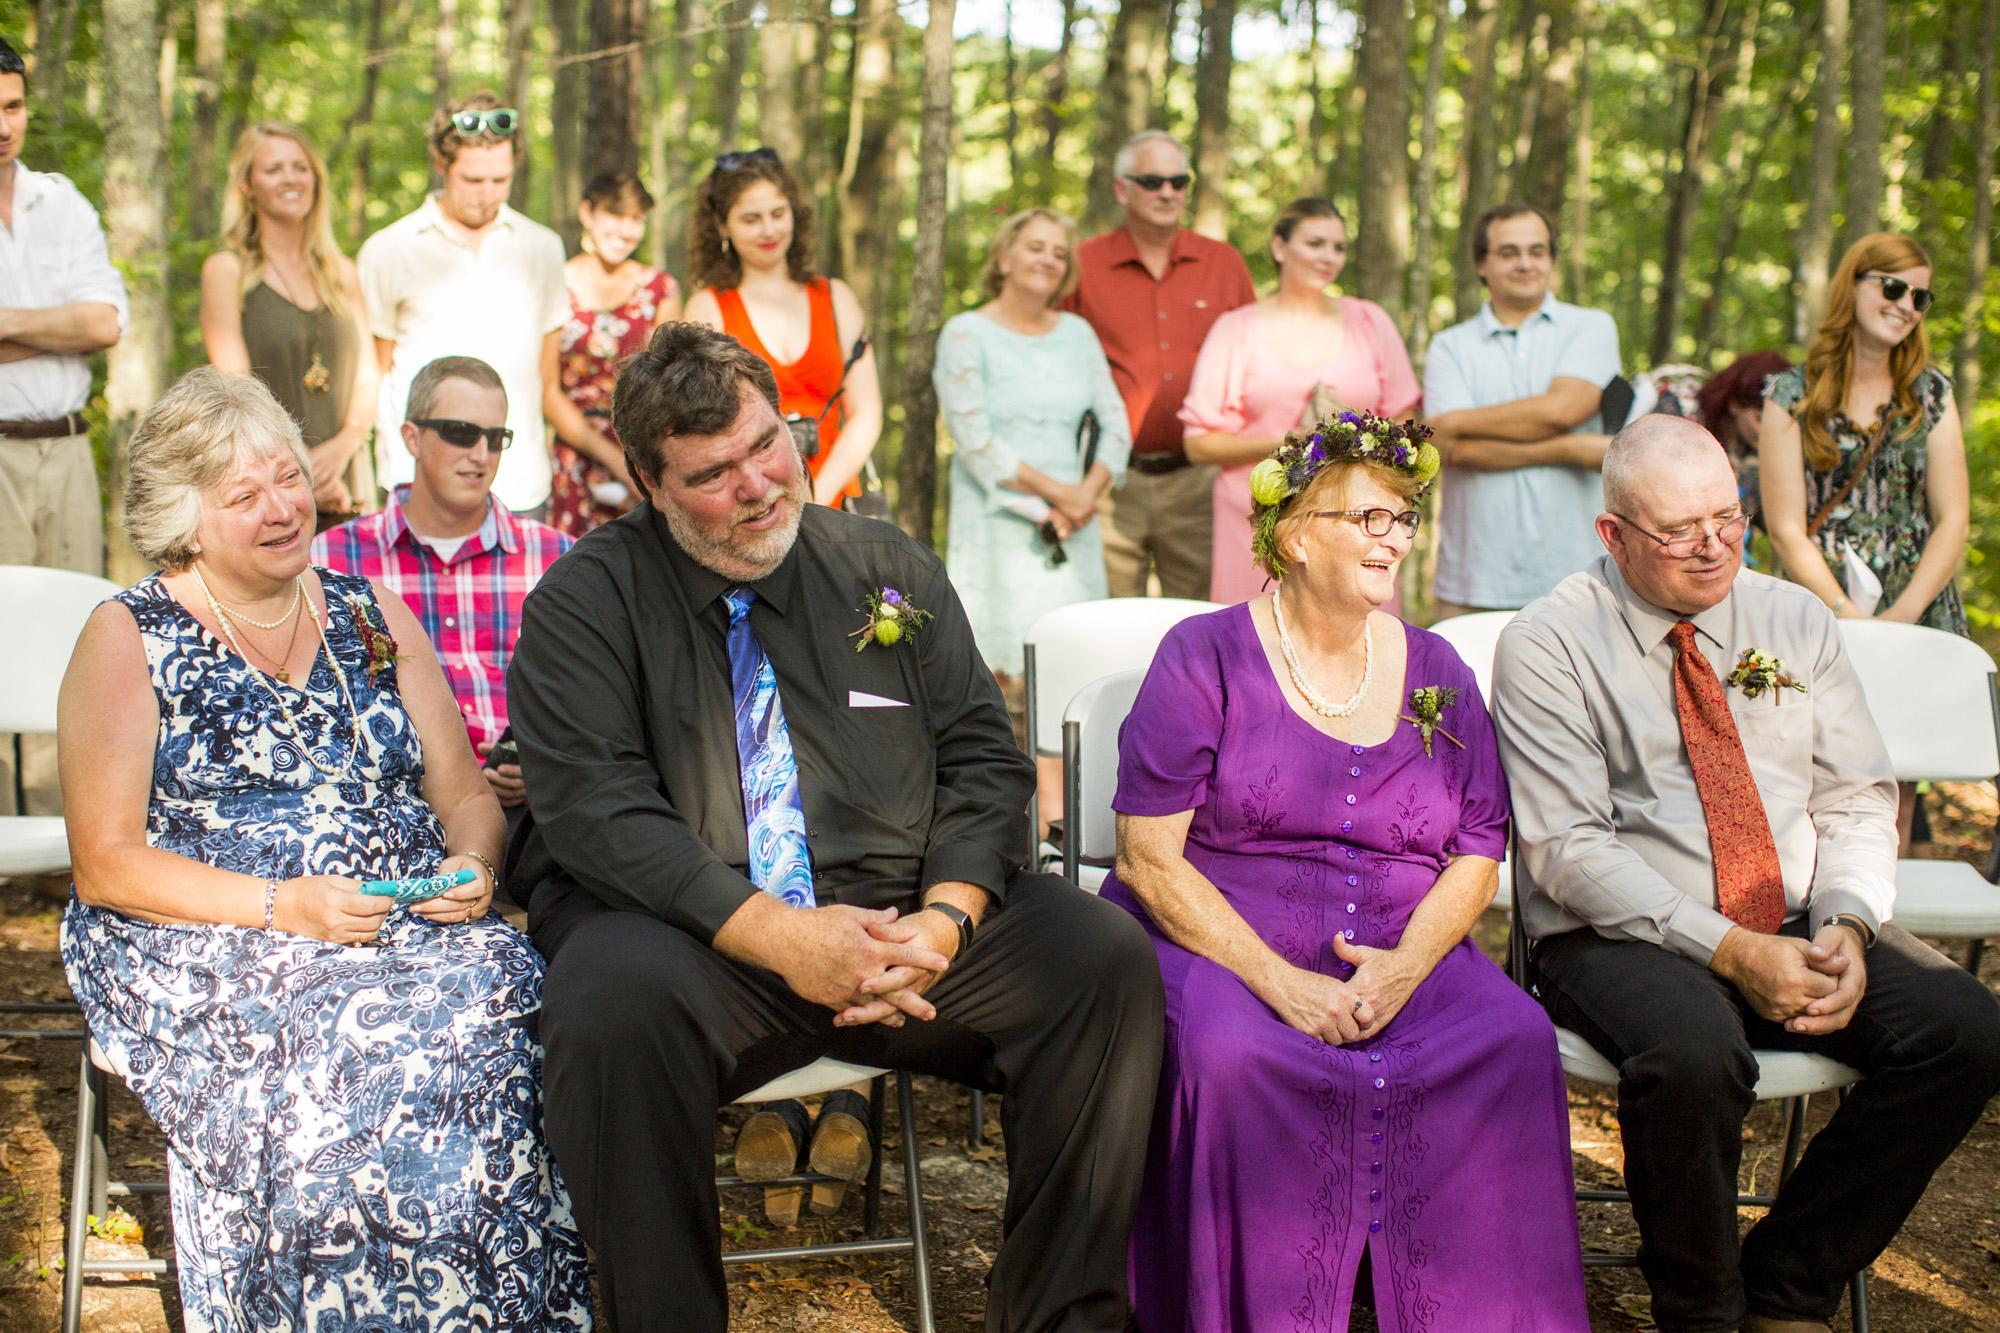 Seriously_Sabrina_Photography_Red_River_Gorge_Kentucky_Wedding_ShawnDana128.jpg